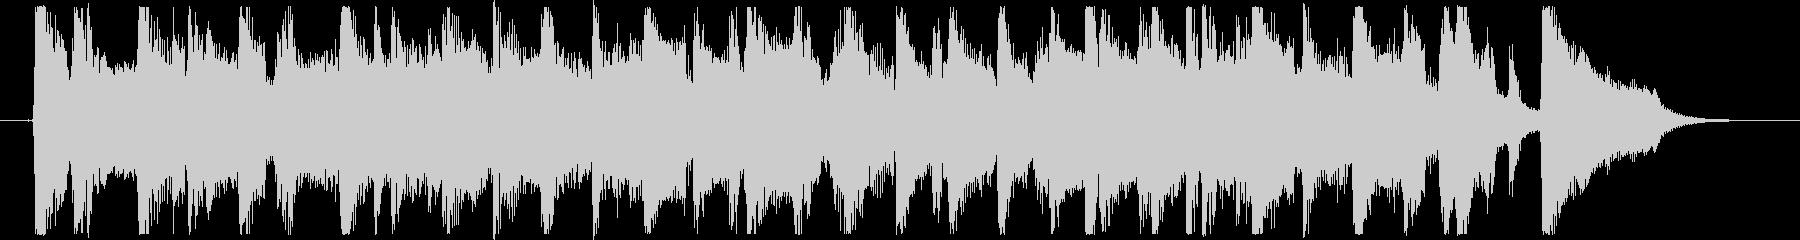 Gloria_lazzVer短尺の未再生の波形